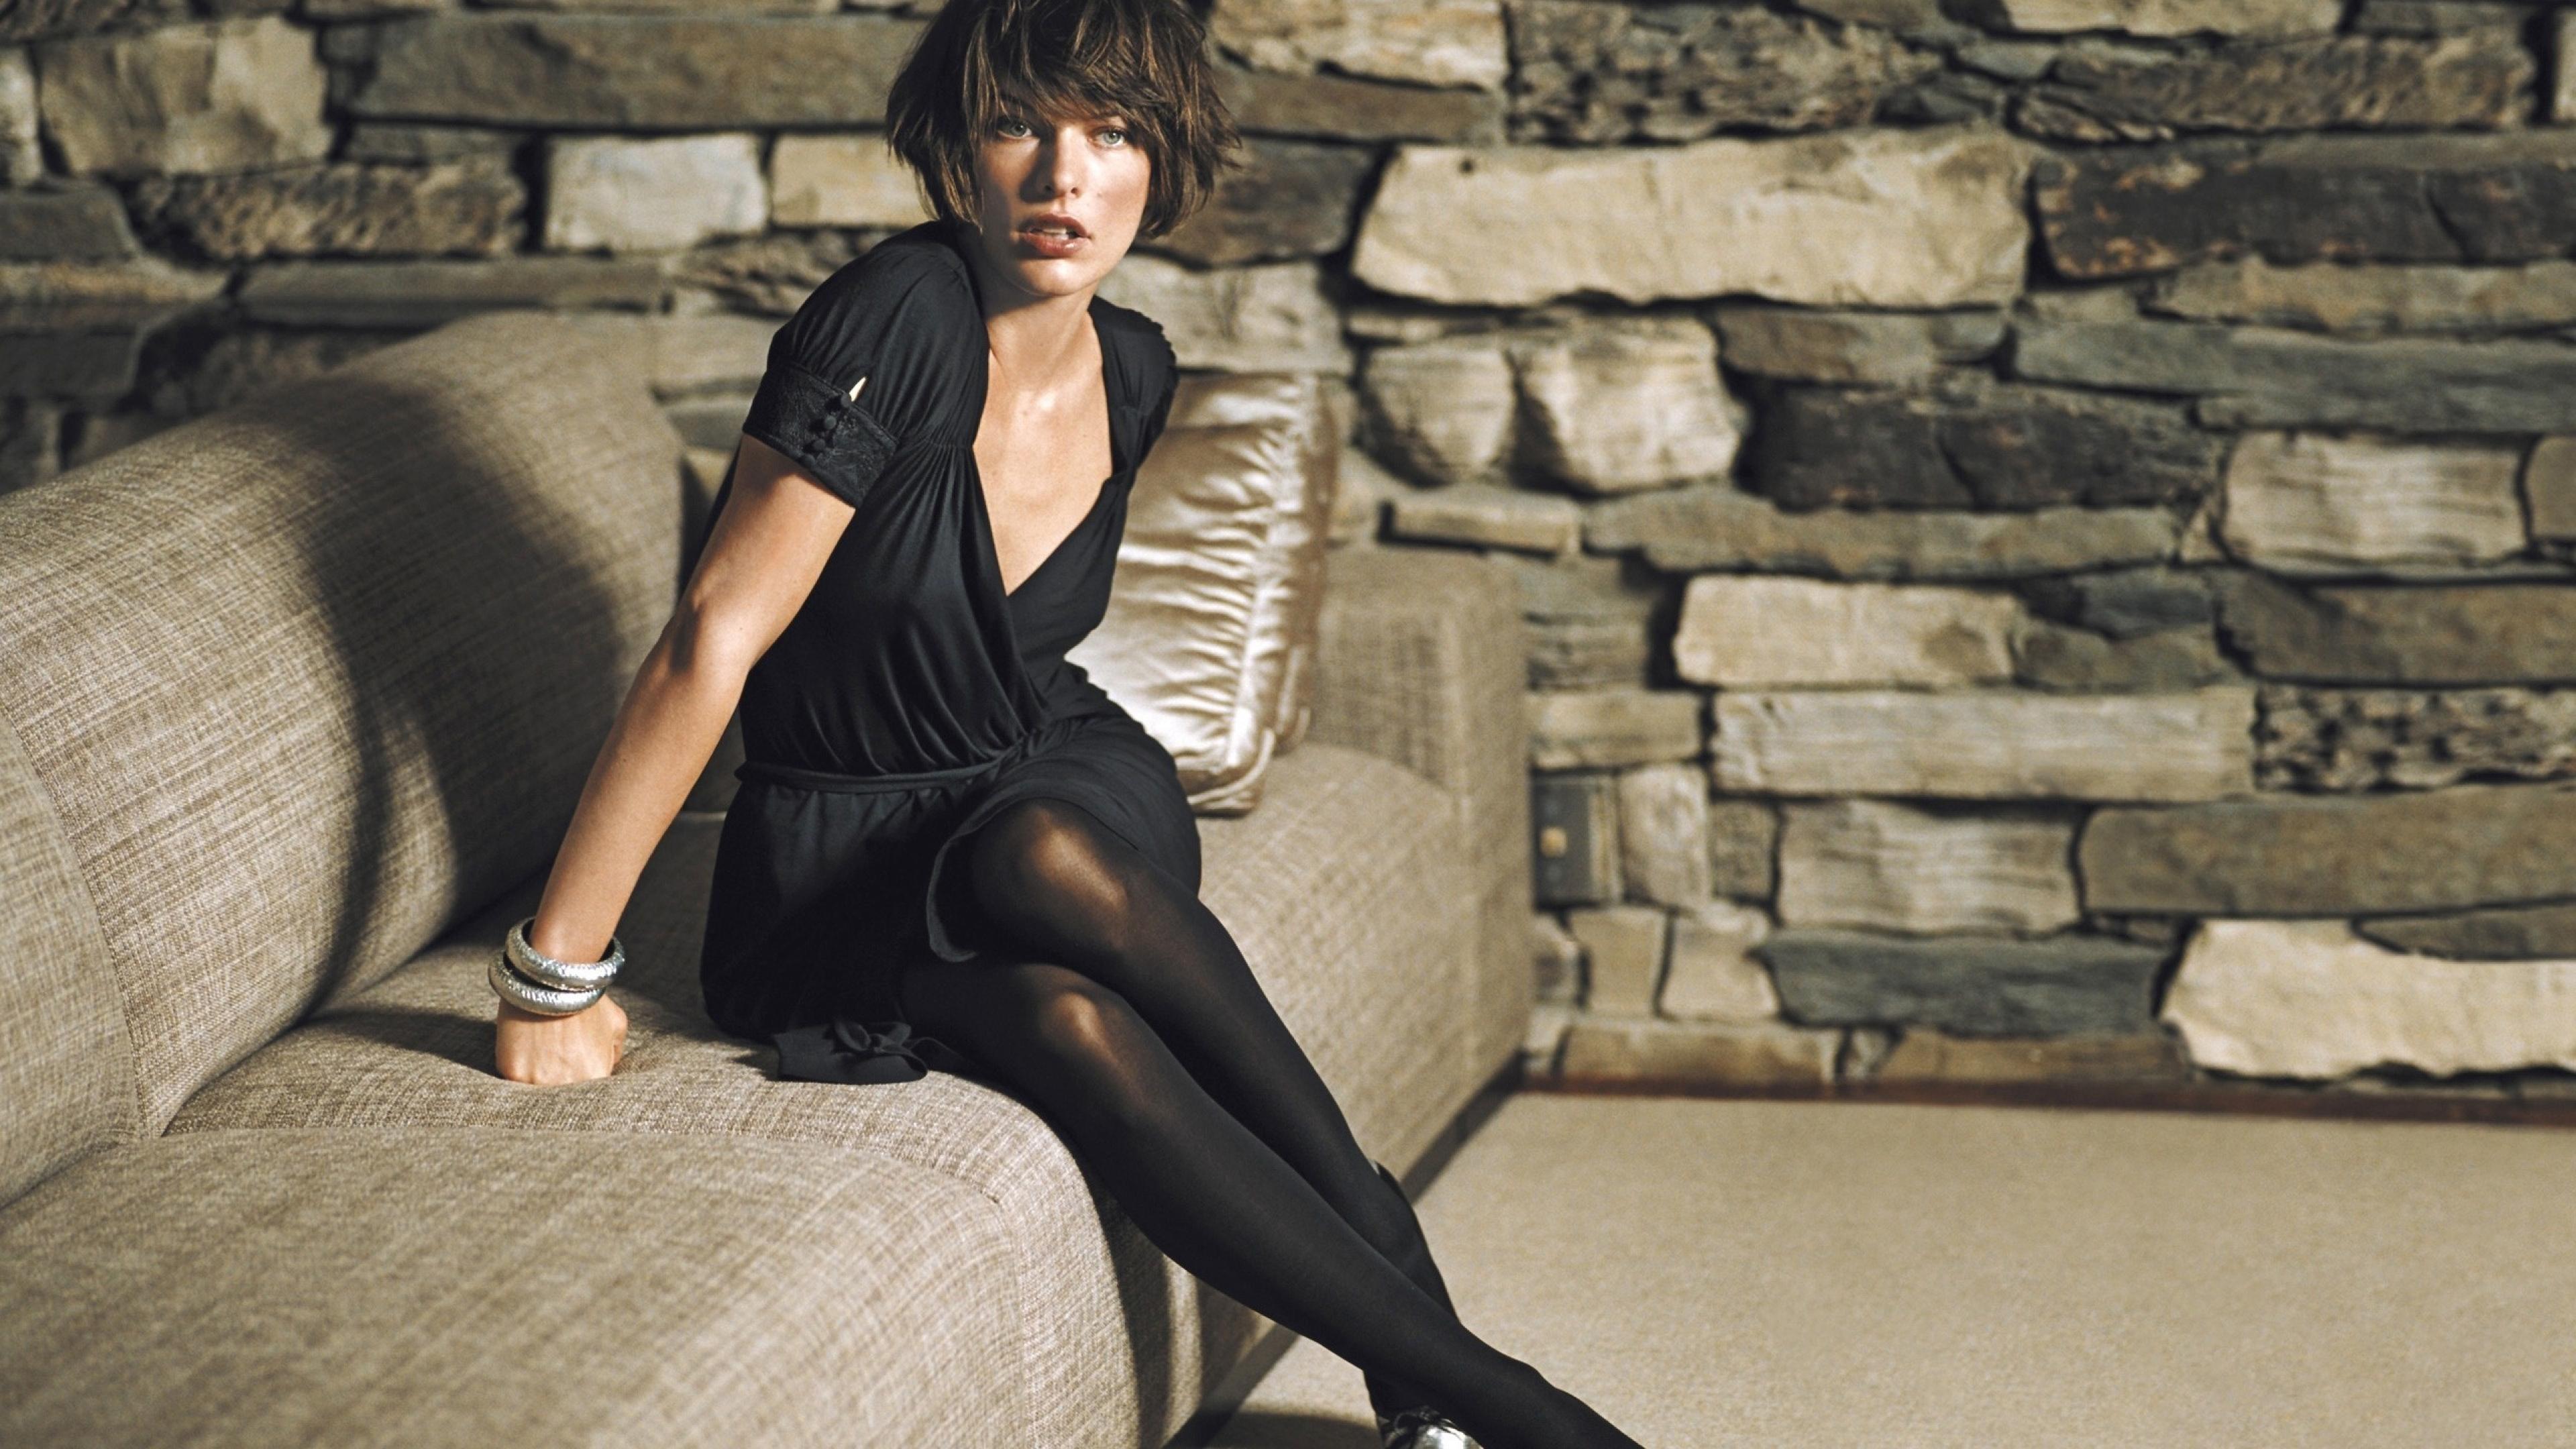 Milla jovovich short hair style photoshoot full hd 2k - Milla jovovich 4k wallpaper ...